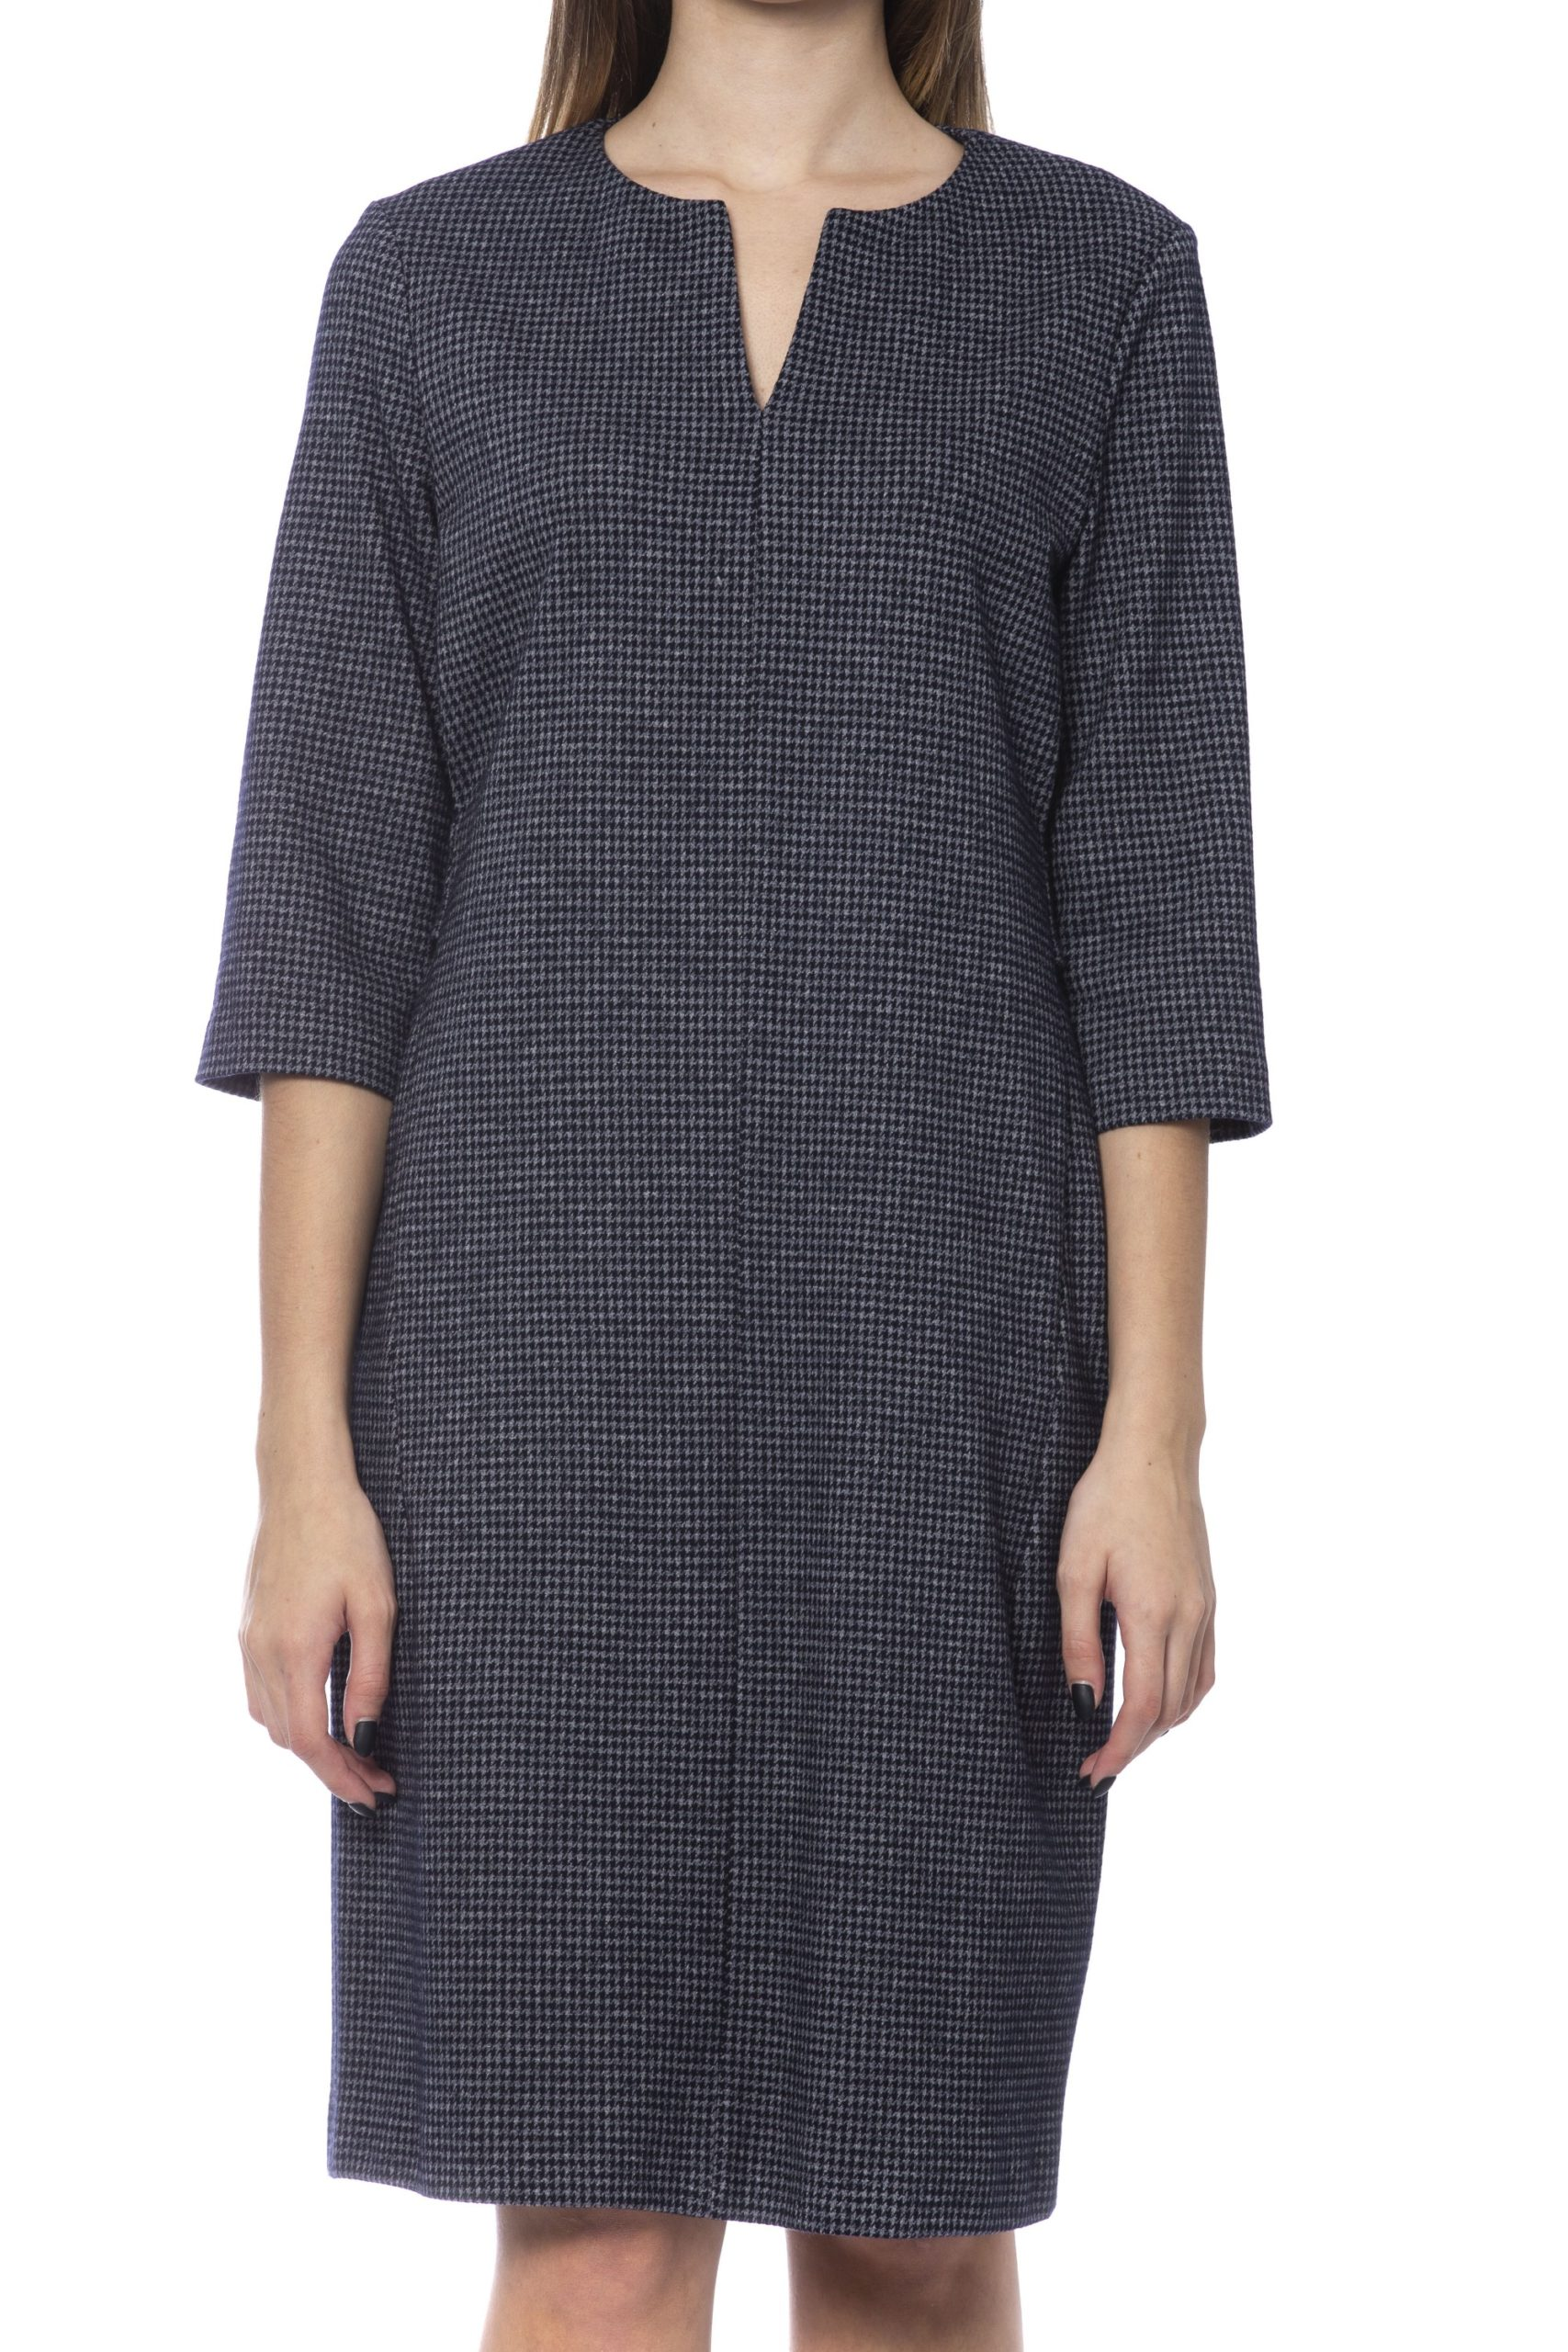 Peserico Women's Dress Blue PE993380 - IT42   S